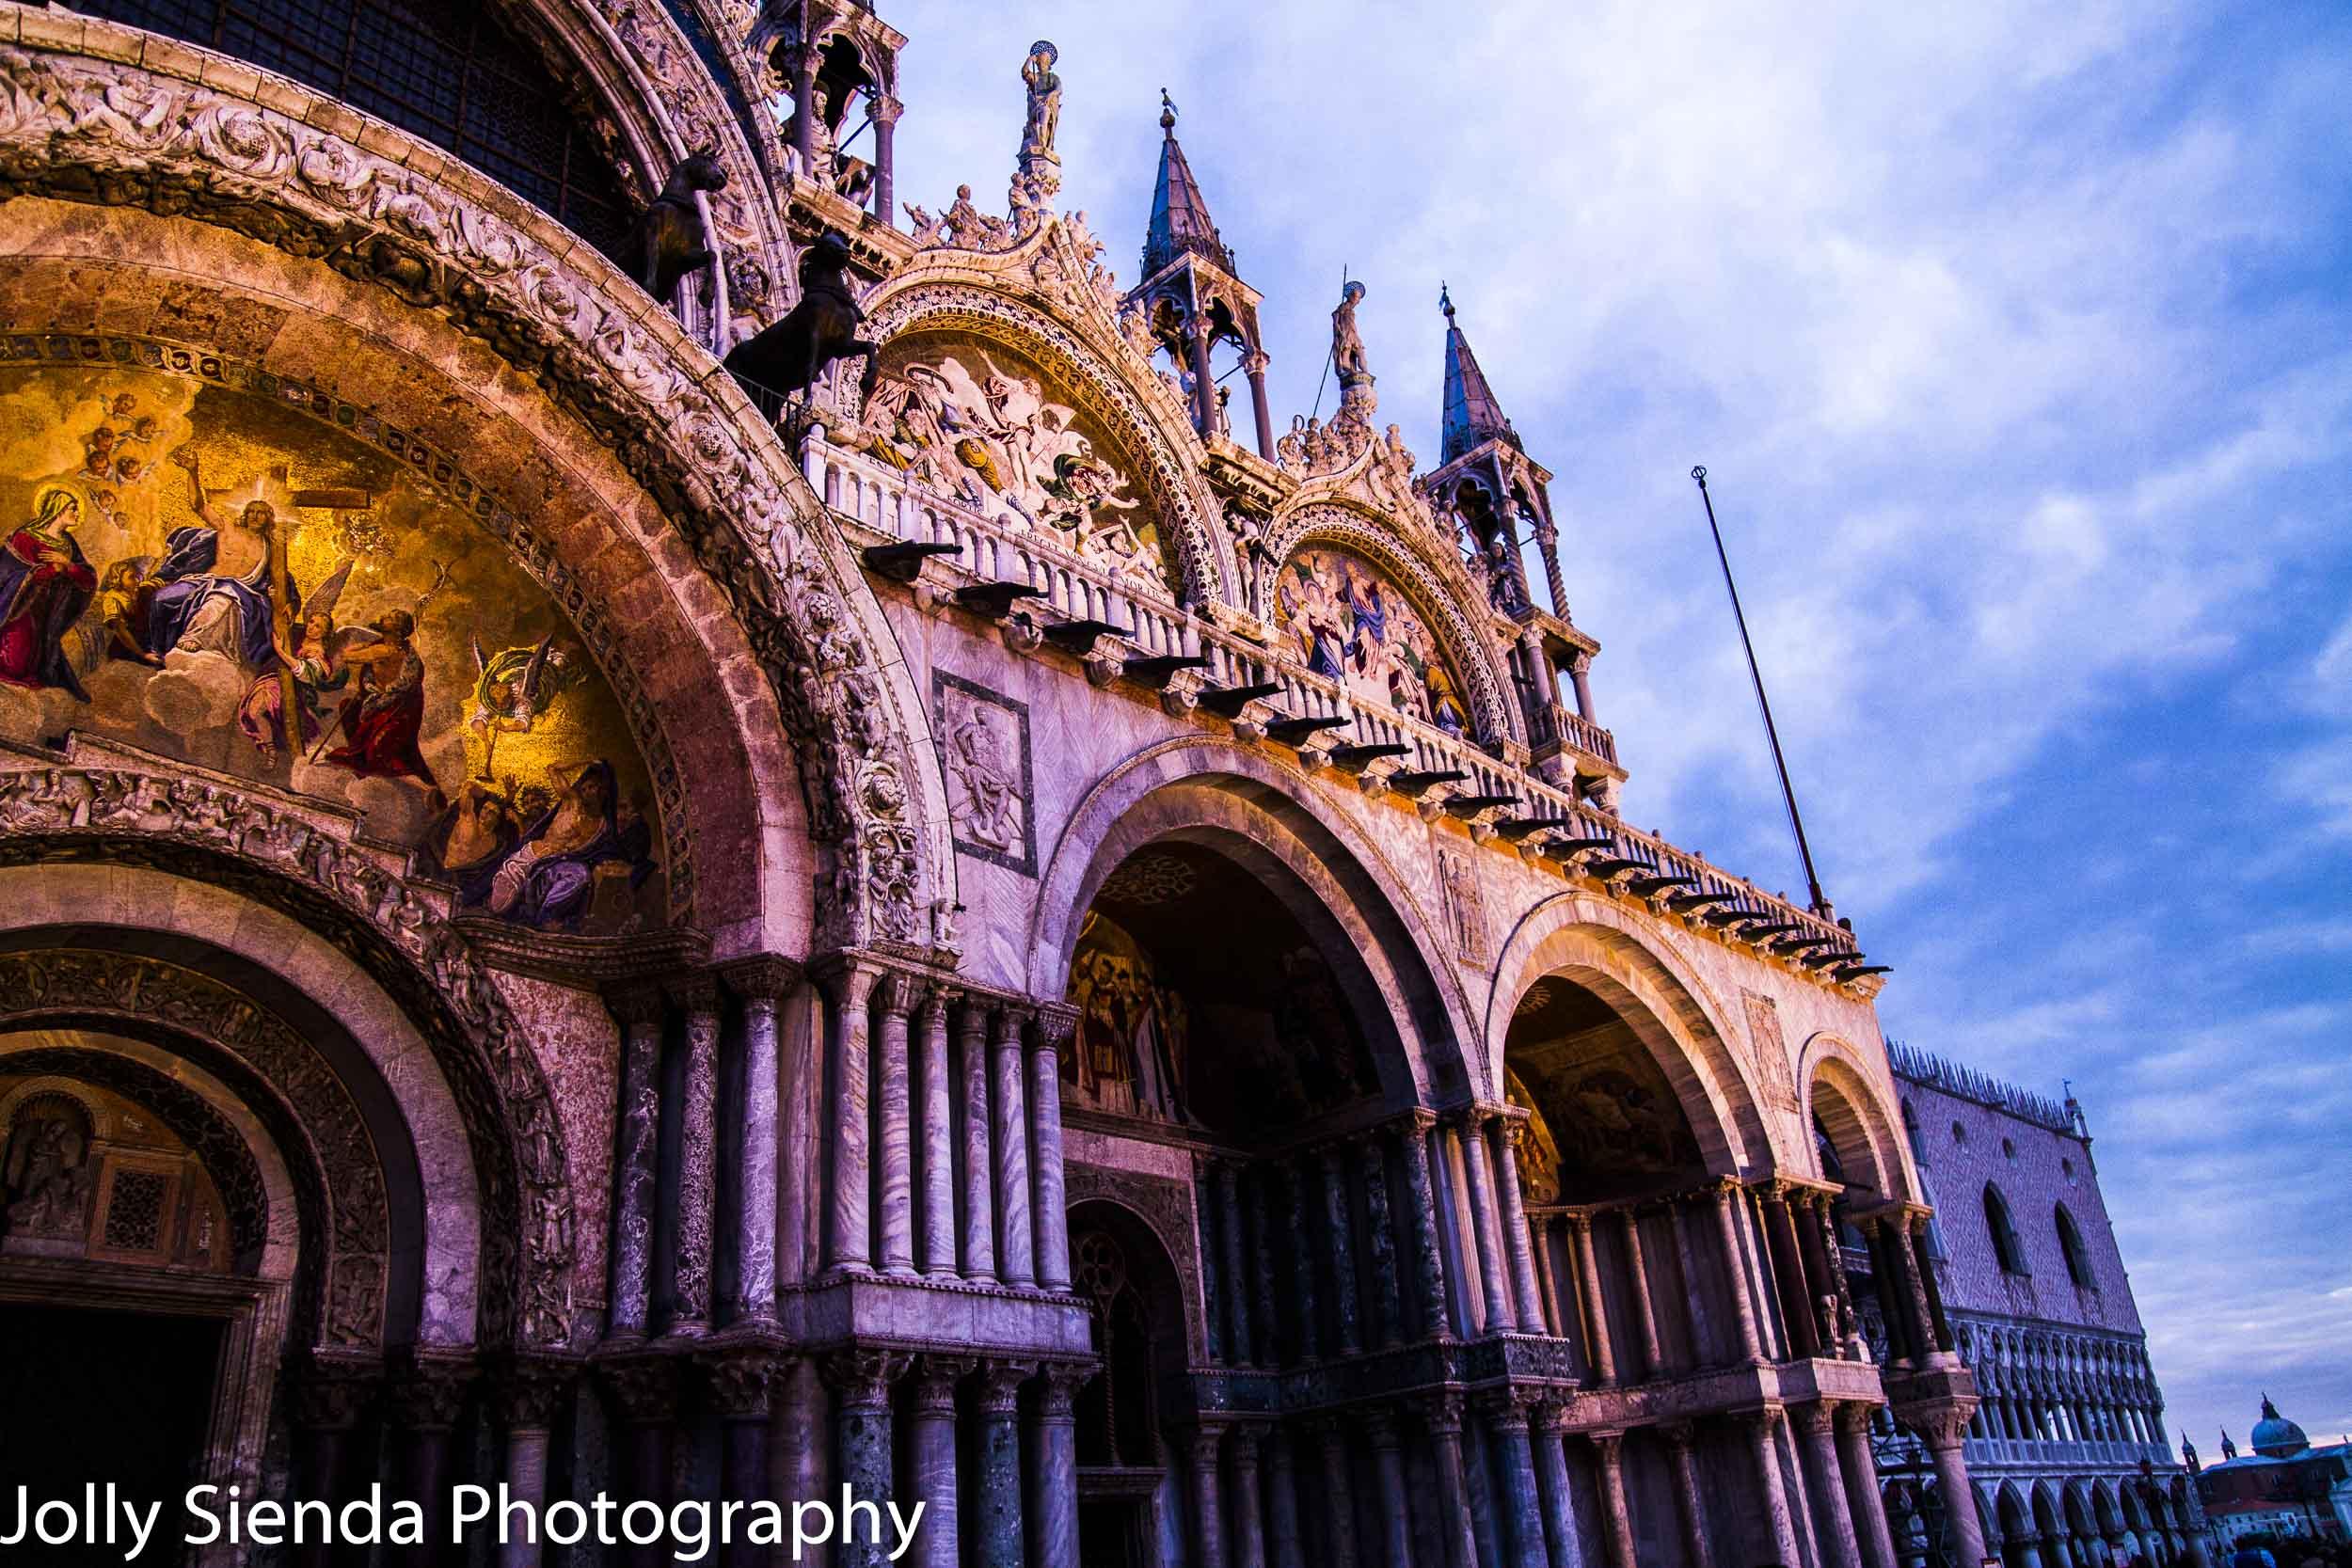 Sunrise light glows on the Basilica di San Marco, Venice